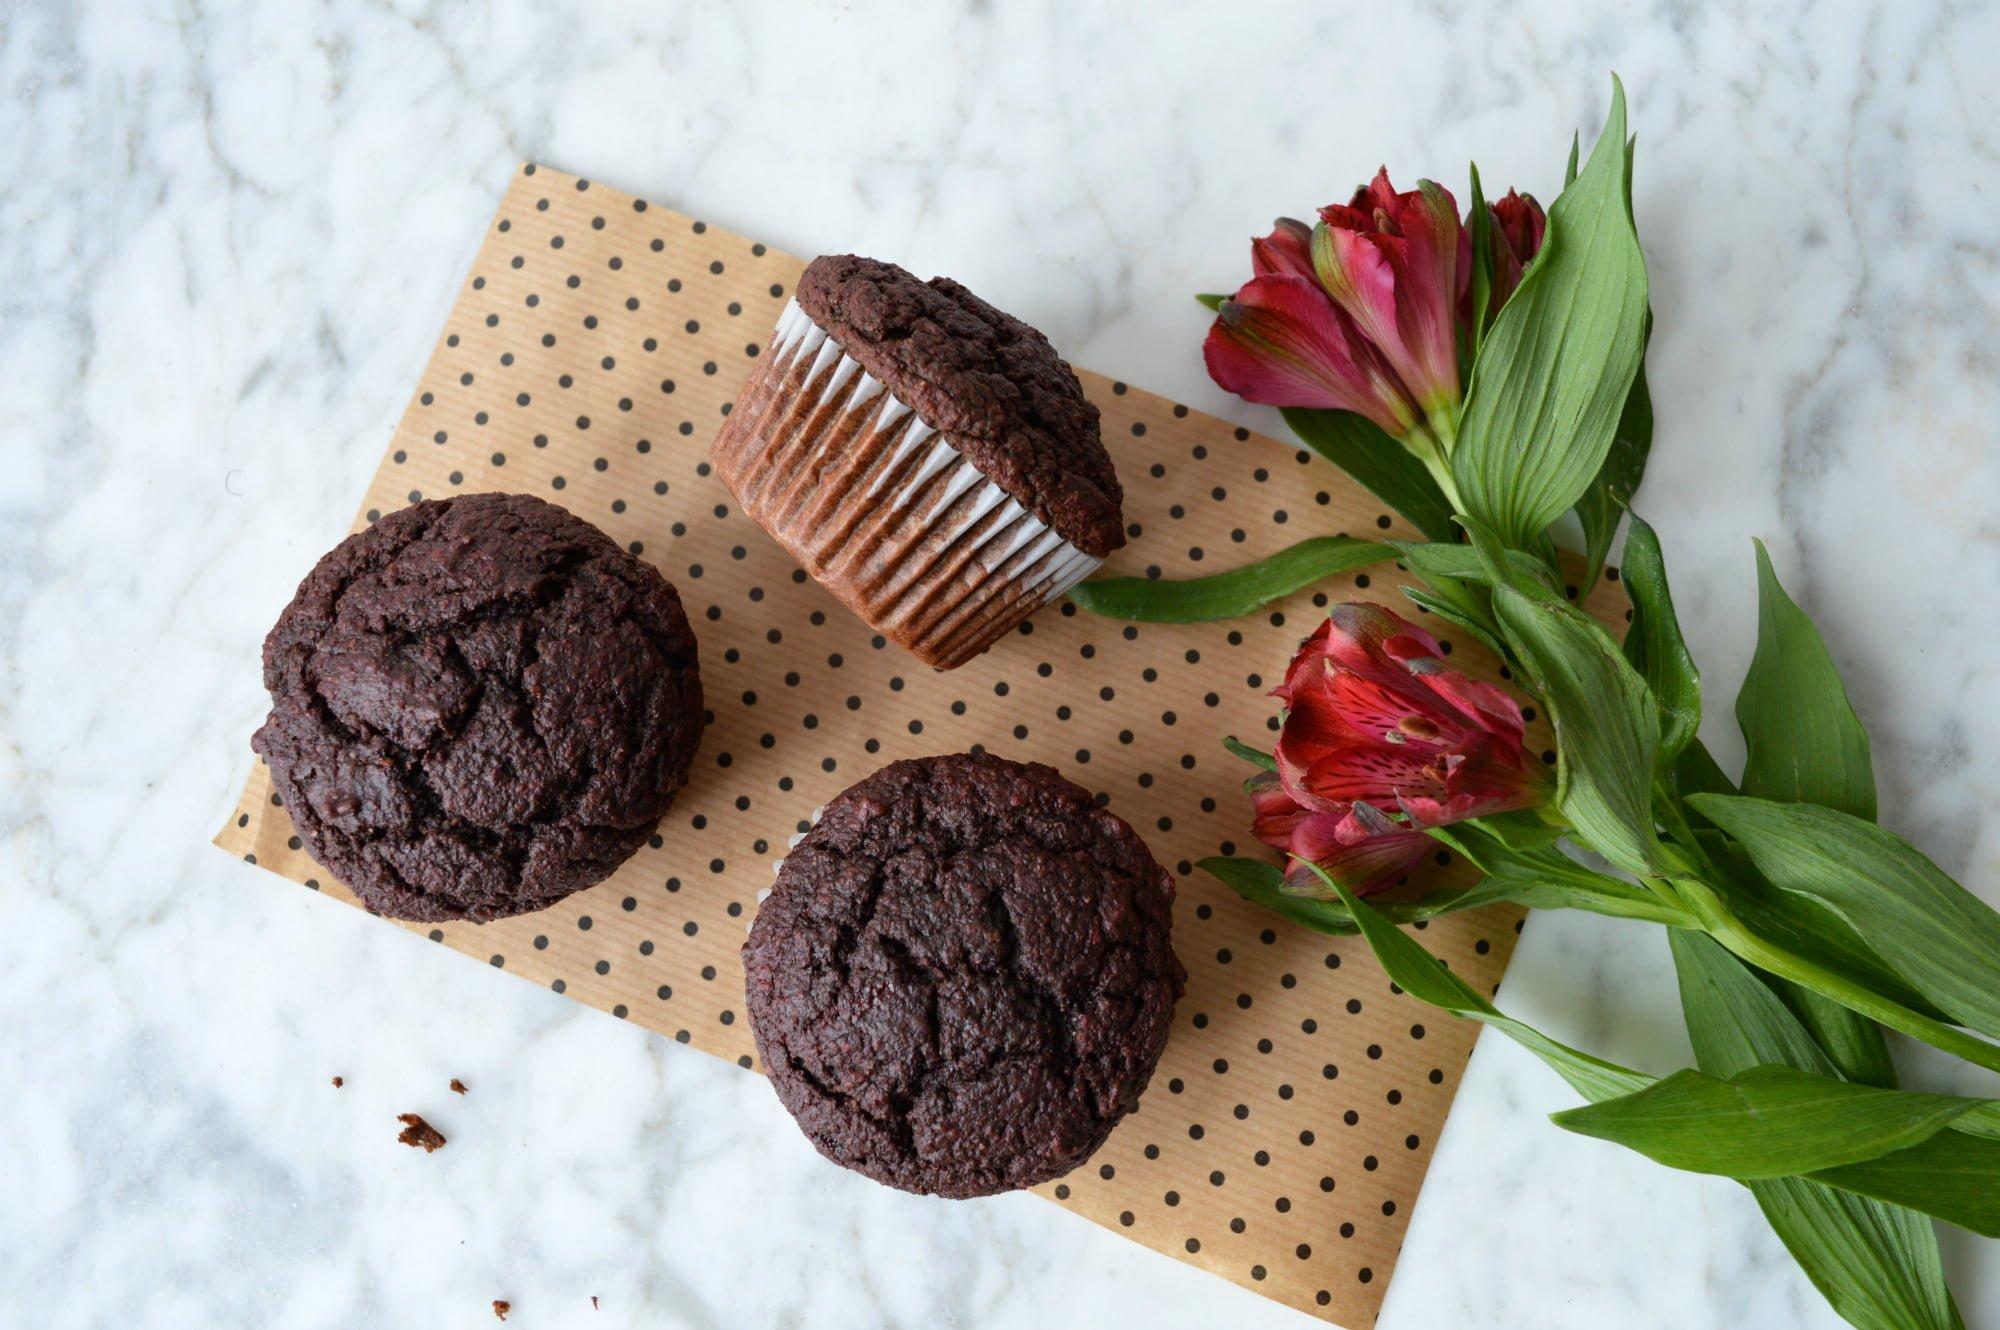 Muffins et fleurs